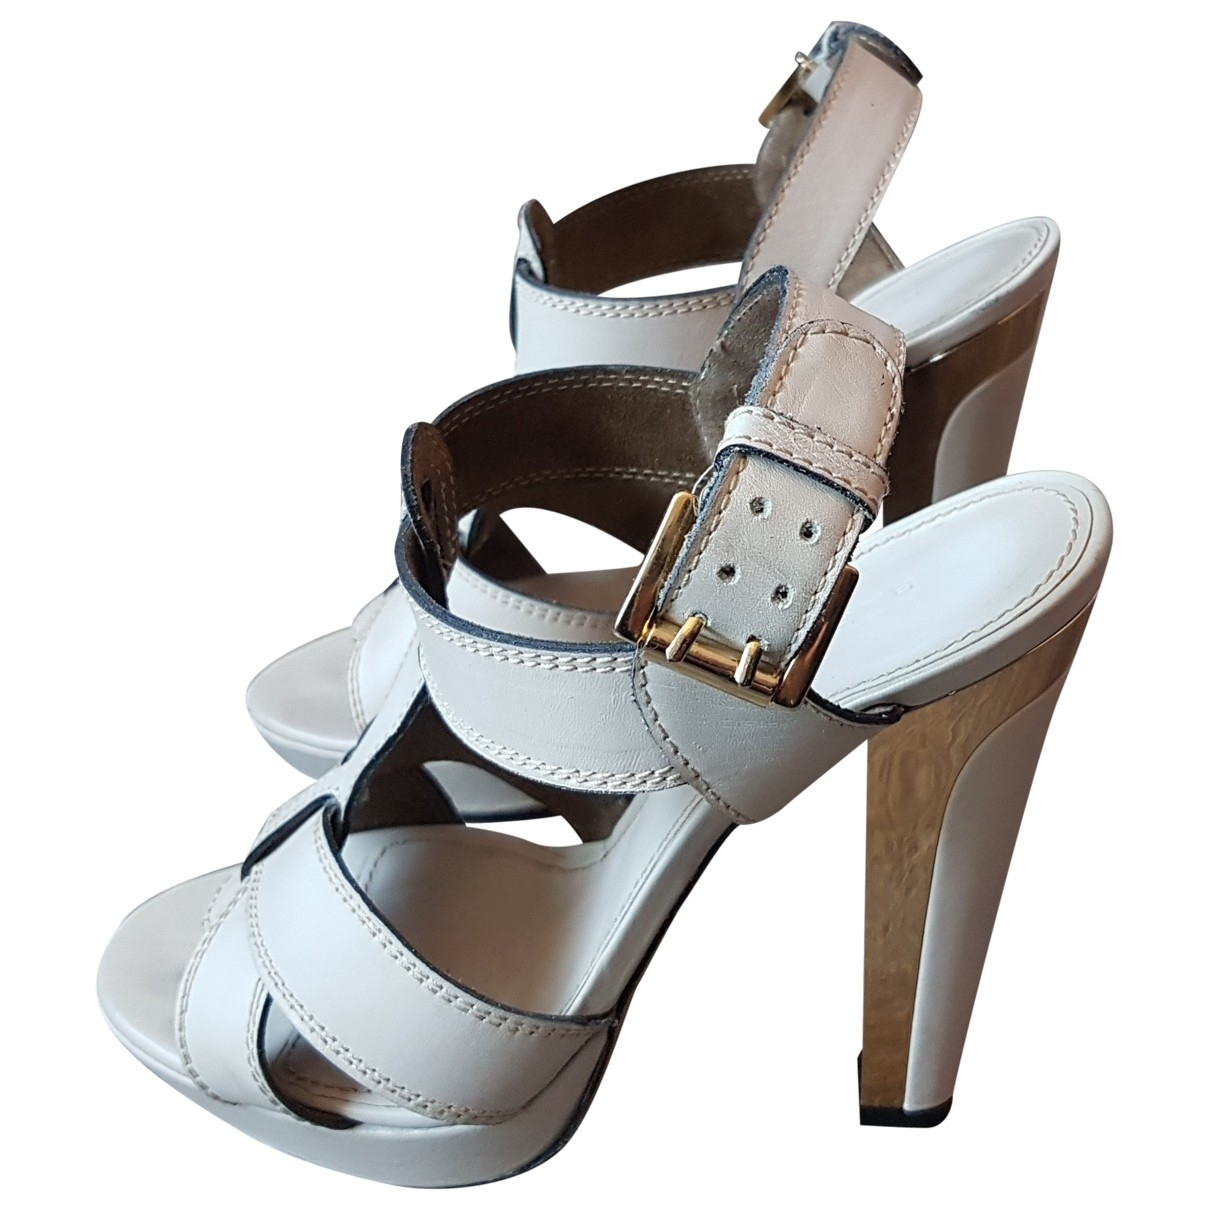 Sandalias de Cuero Barbara Bui